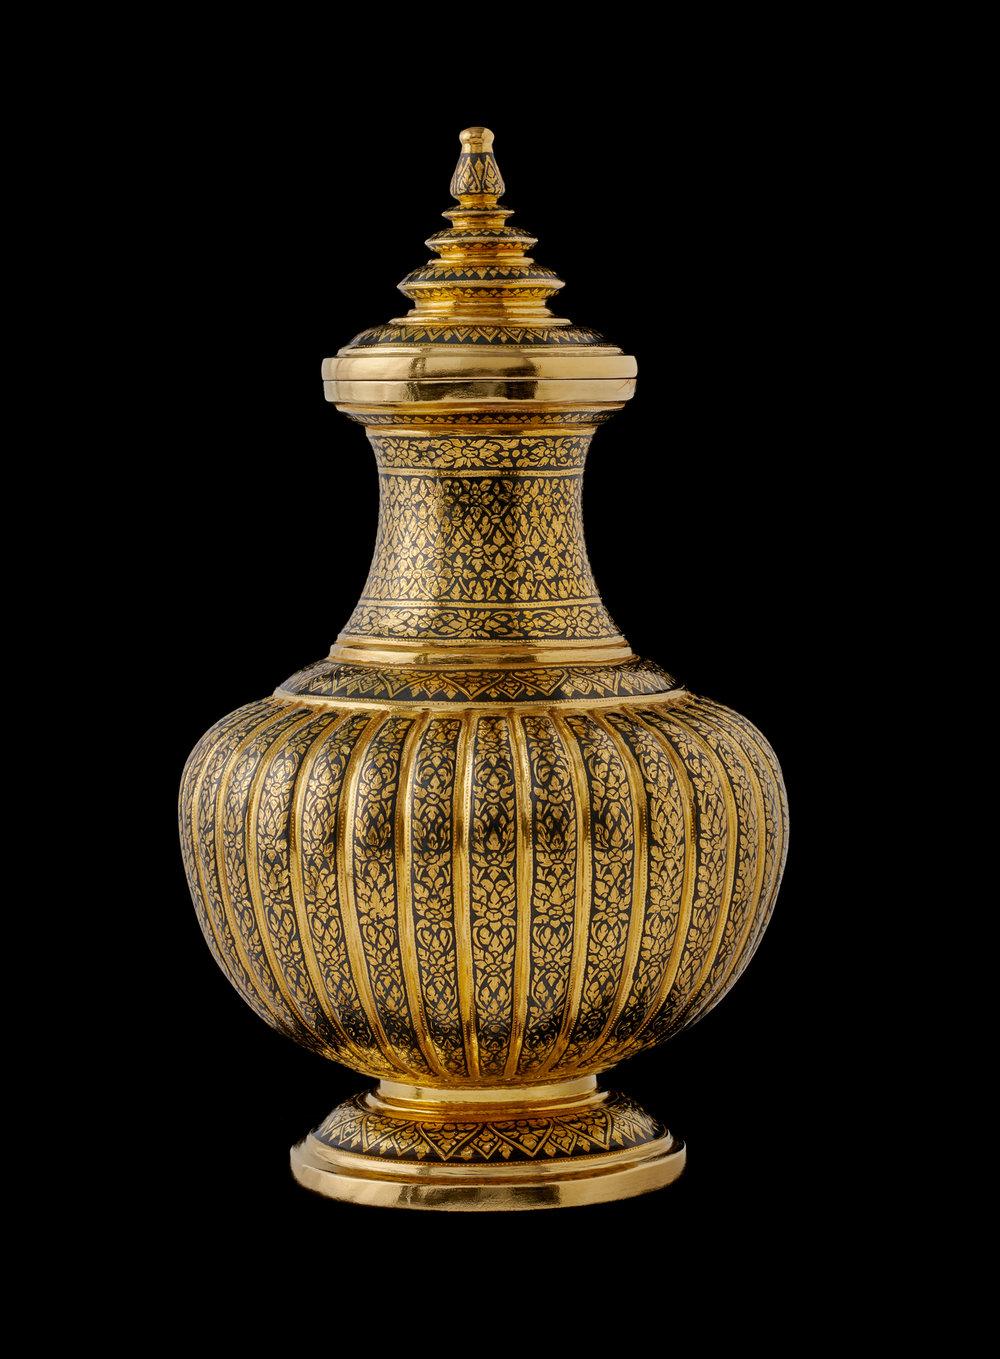 Gold Niello Water Container Gift from Their Majesties to President William J. Clinton and First Lady Hillary Clinton, 1996 27.5 x 15.2 cm Courtesy of the William J. Clinton Presidential Library and Museum; 4934398.06  พระกรัณฑ์ถมทอง ของขวัญพระราชทานจากพระบาทสมเด็จพระปรมินทรมหาภูมิพลอดุลยเดชและสมเด็จพระนางเจ้าสิริกิติ์ พระบรมราชินีนาถ แก่ประธานาธิบดีวิลเลียม เจ. คลินตัน และนางฮิลลารี คลินตัน สุภาพสตรีหมายเลขหนึ่ง พ.ศ. ๒๕๓๙ ๒๗.๕ x ๑๕.๒ ซม. ได้รับความอนุเคราะห์จากพิพิธภัณฑ์และหอสมุดประธานาธิบดีวิลเลียม เจ. คลินตัน; 4934398.06